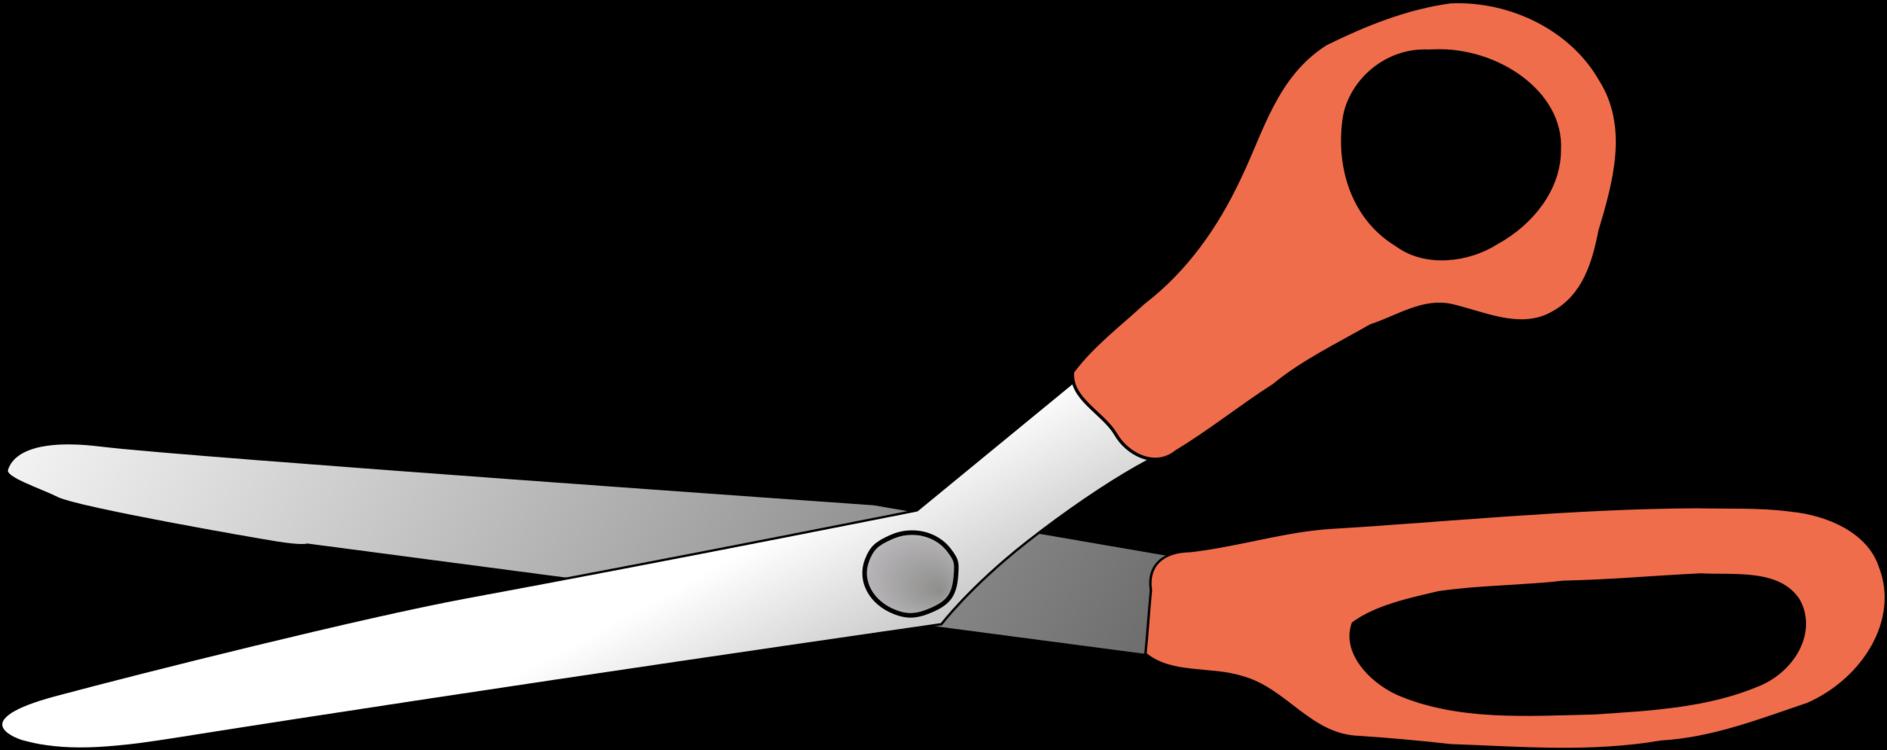 Angle,Tool,Hardware